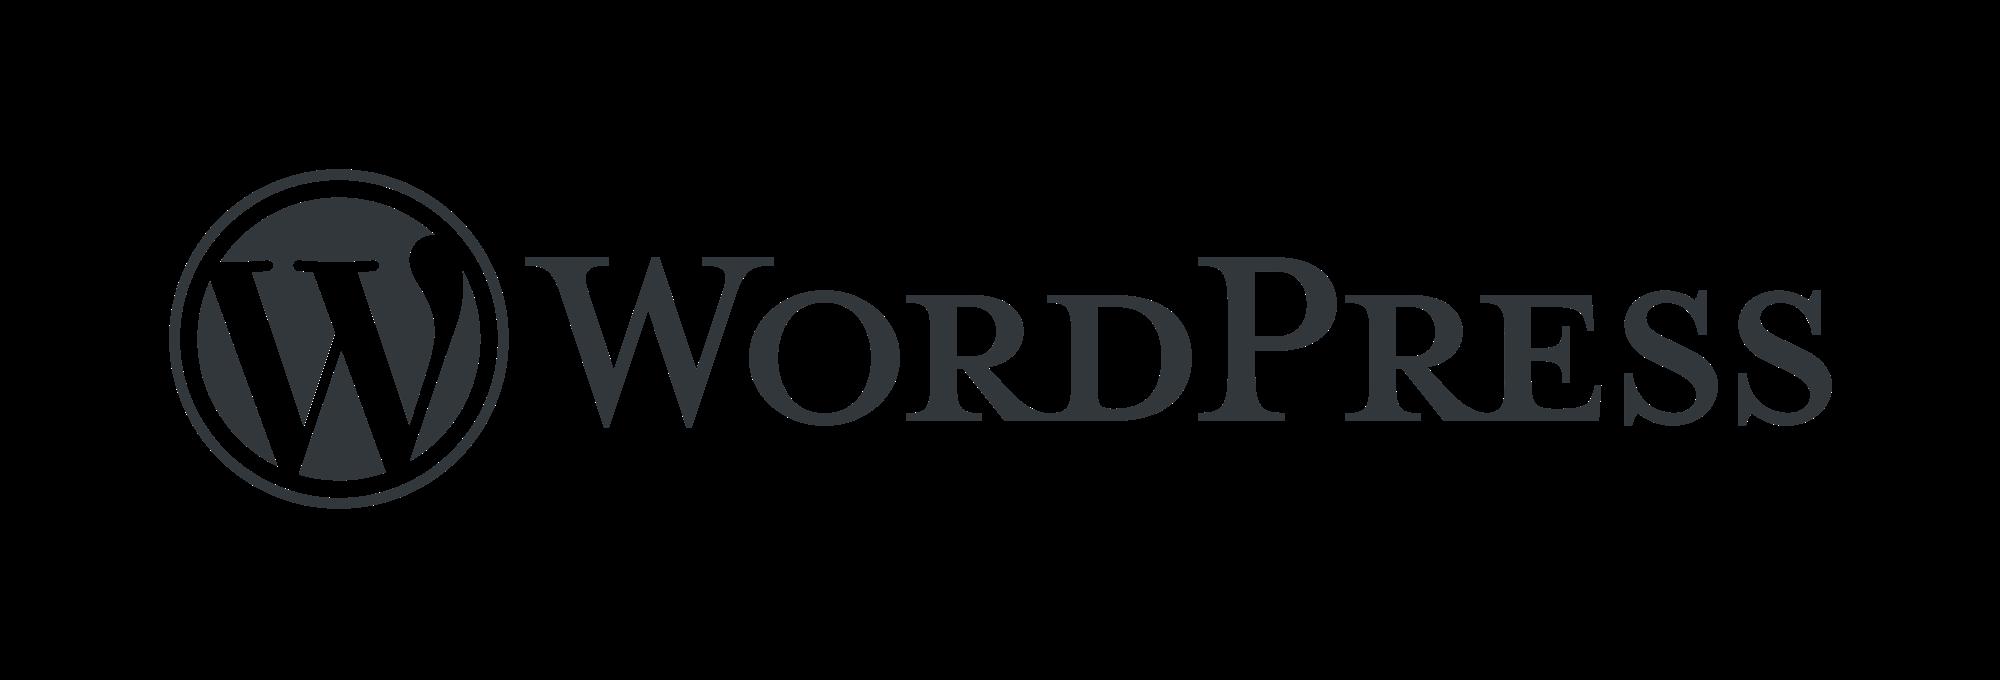 WordPress-logotype-standard copy 3